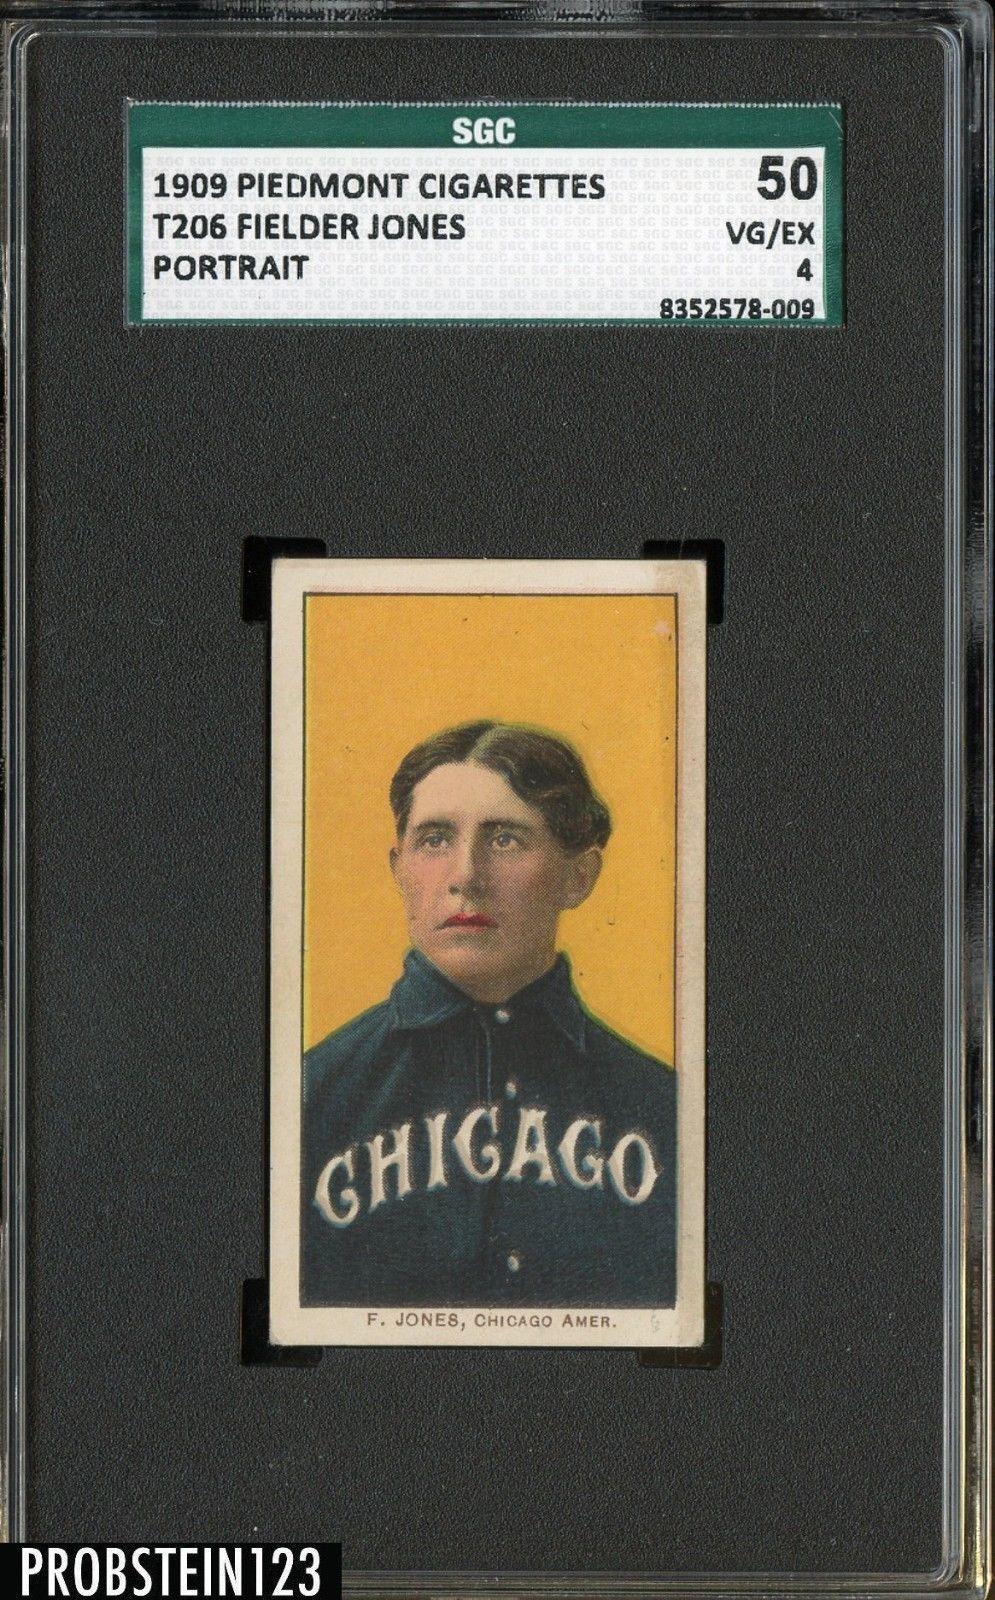 T206 Fielder Jones Portrait Piedmont 150 Subjects SGC 50